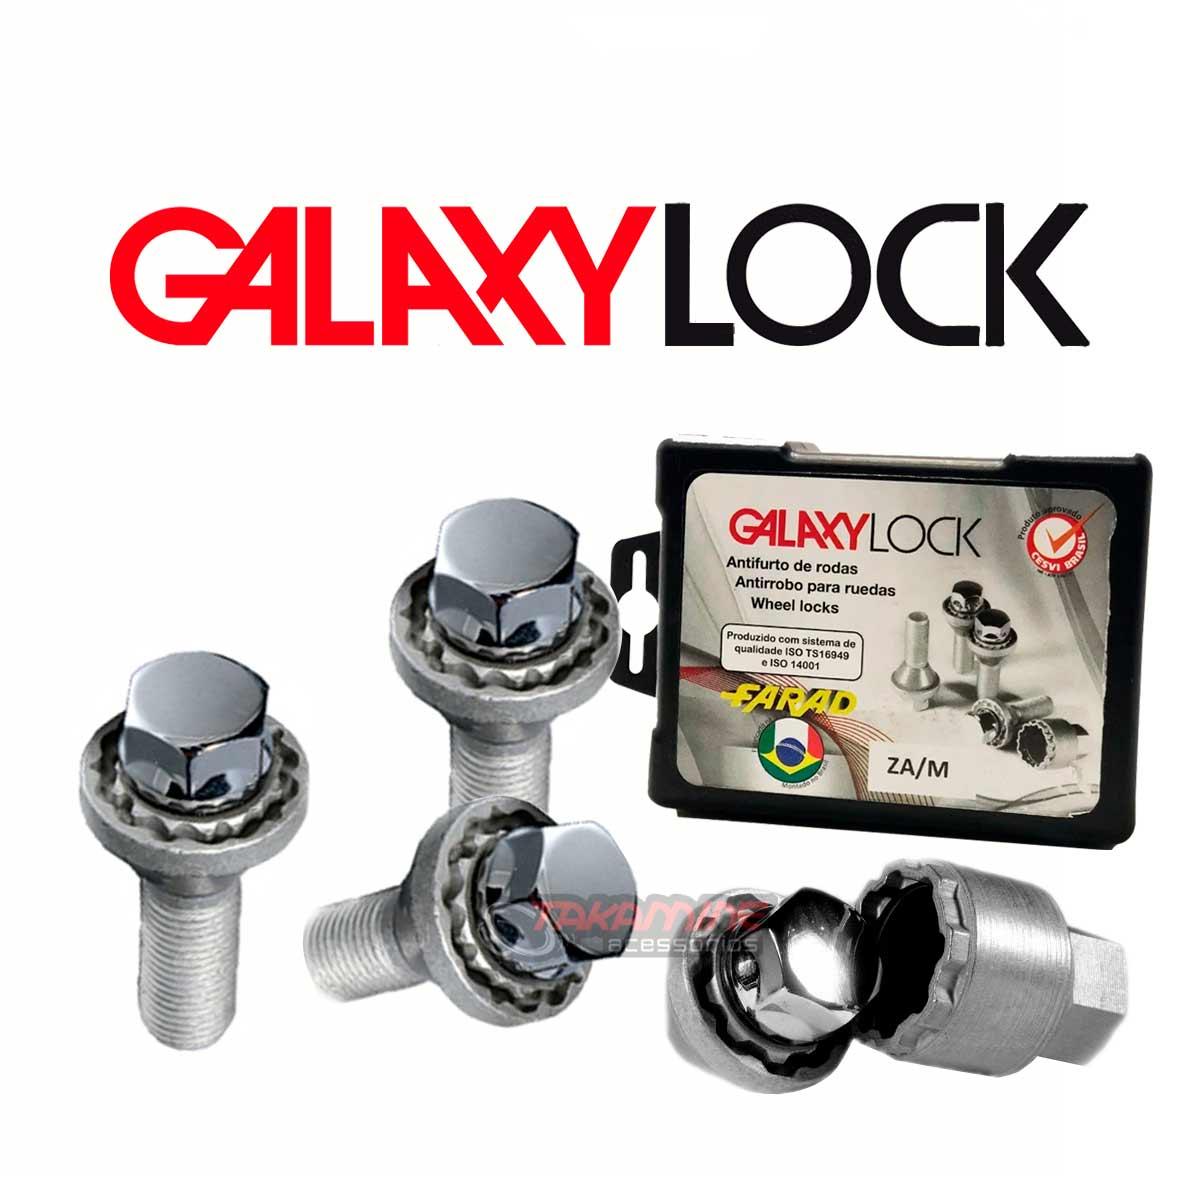 Parafuso antifurto para rodas Galaxy Lock Tiggo 7 (roda de liga)